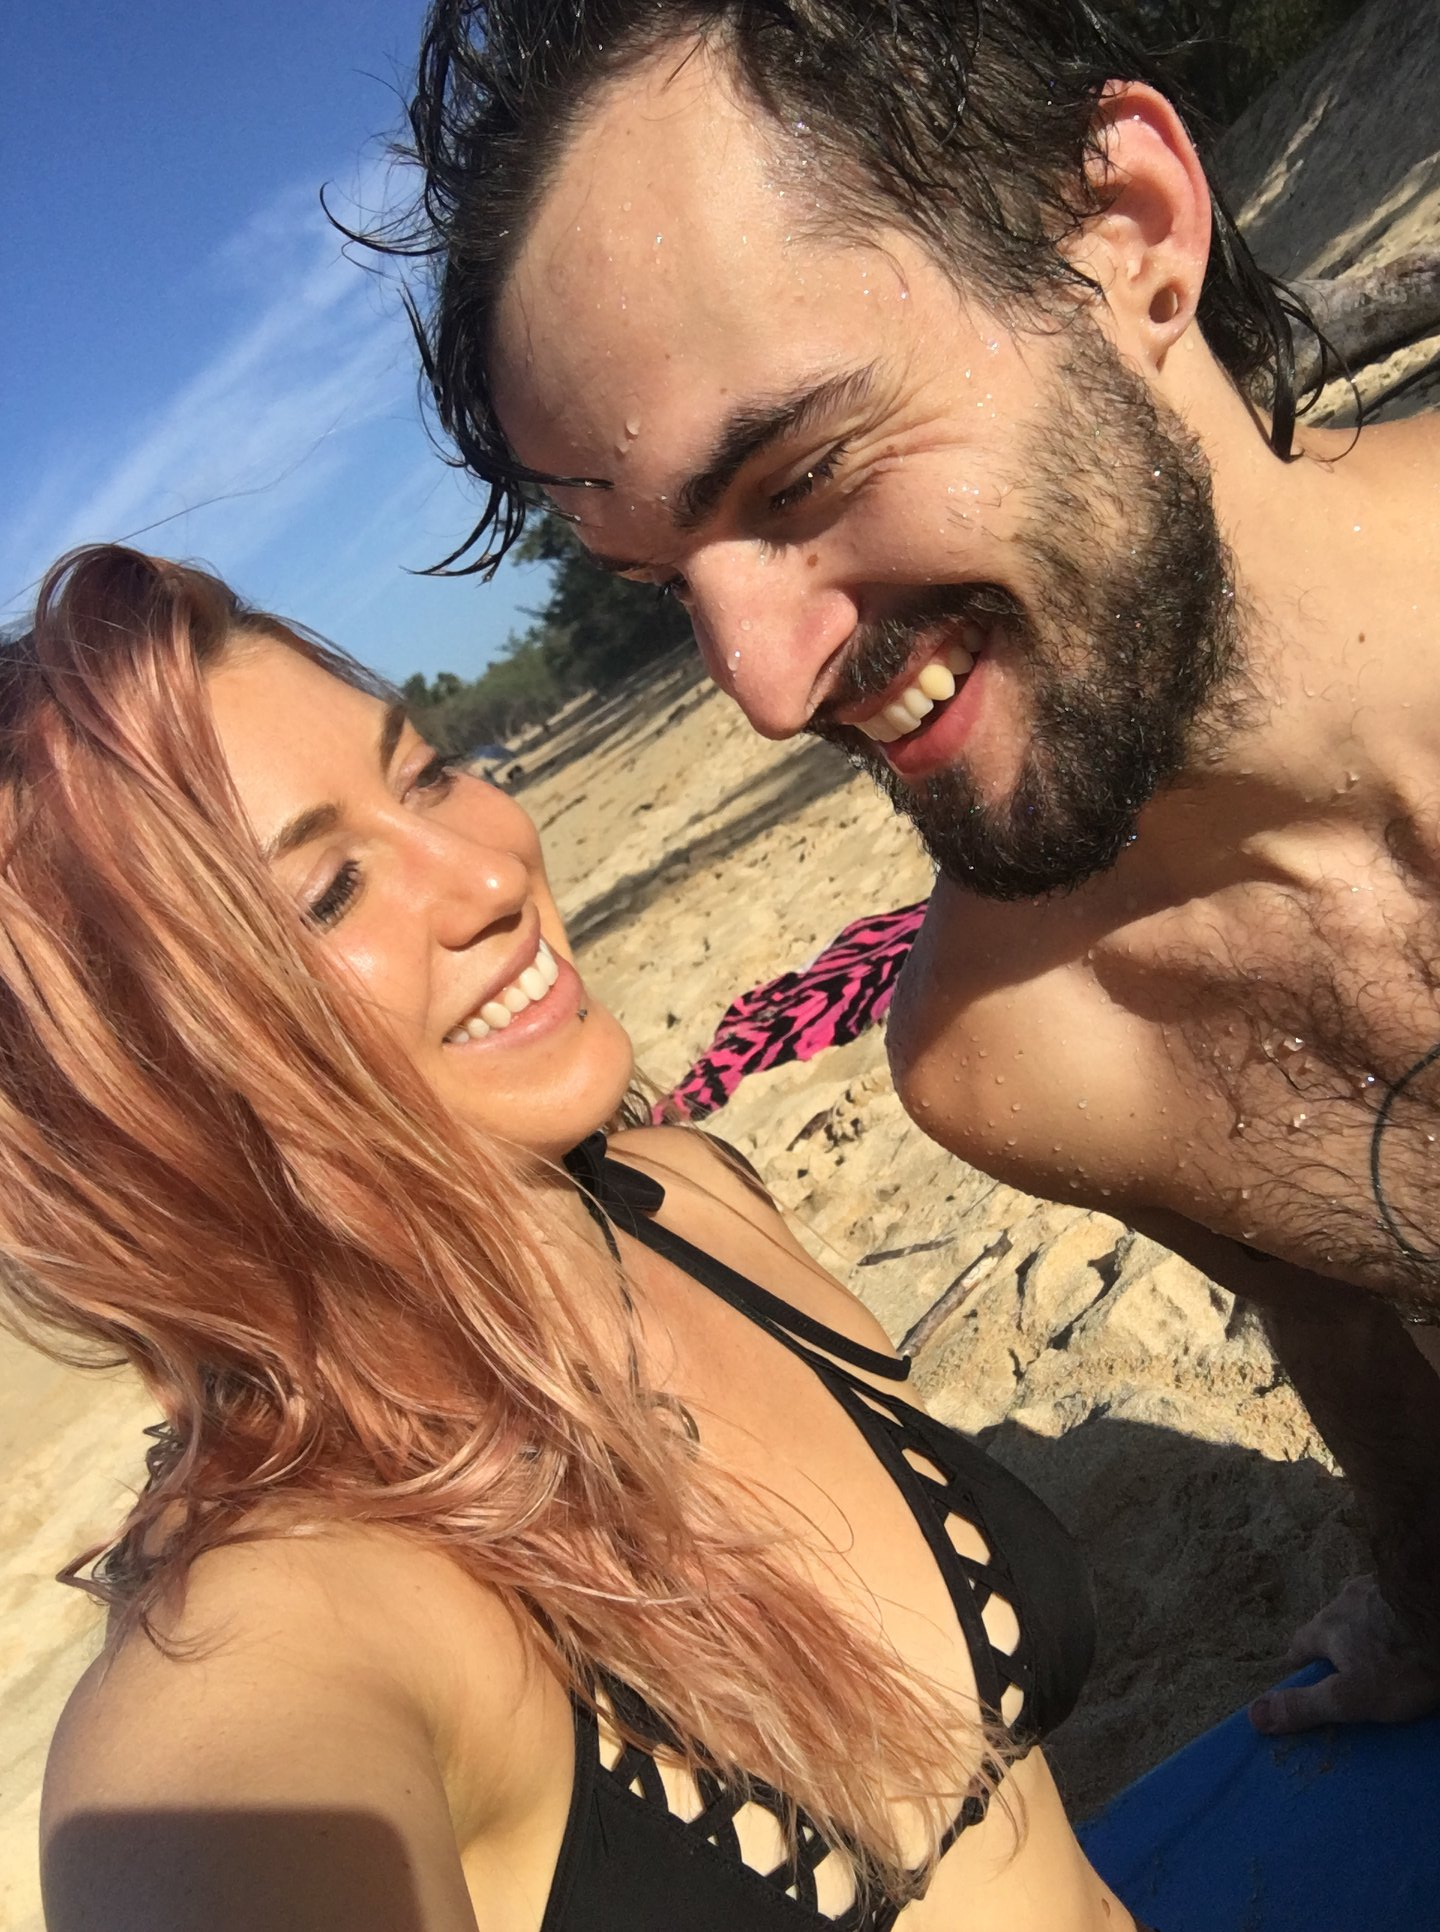 On the beach in Maui on my birthday